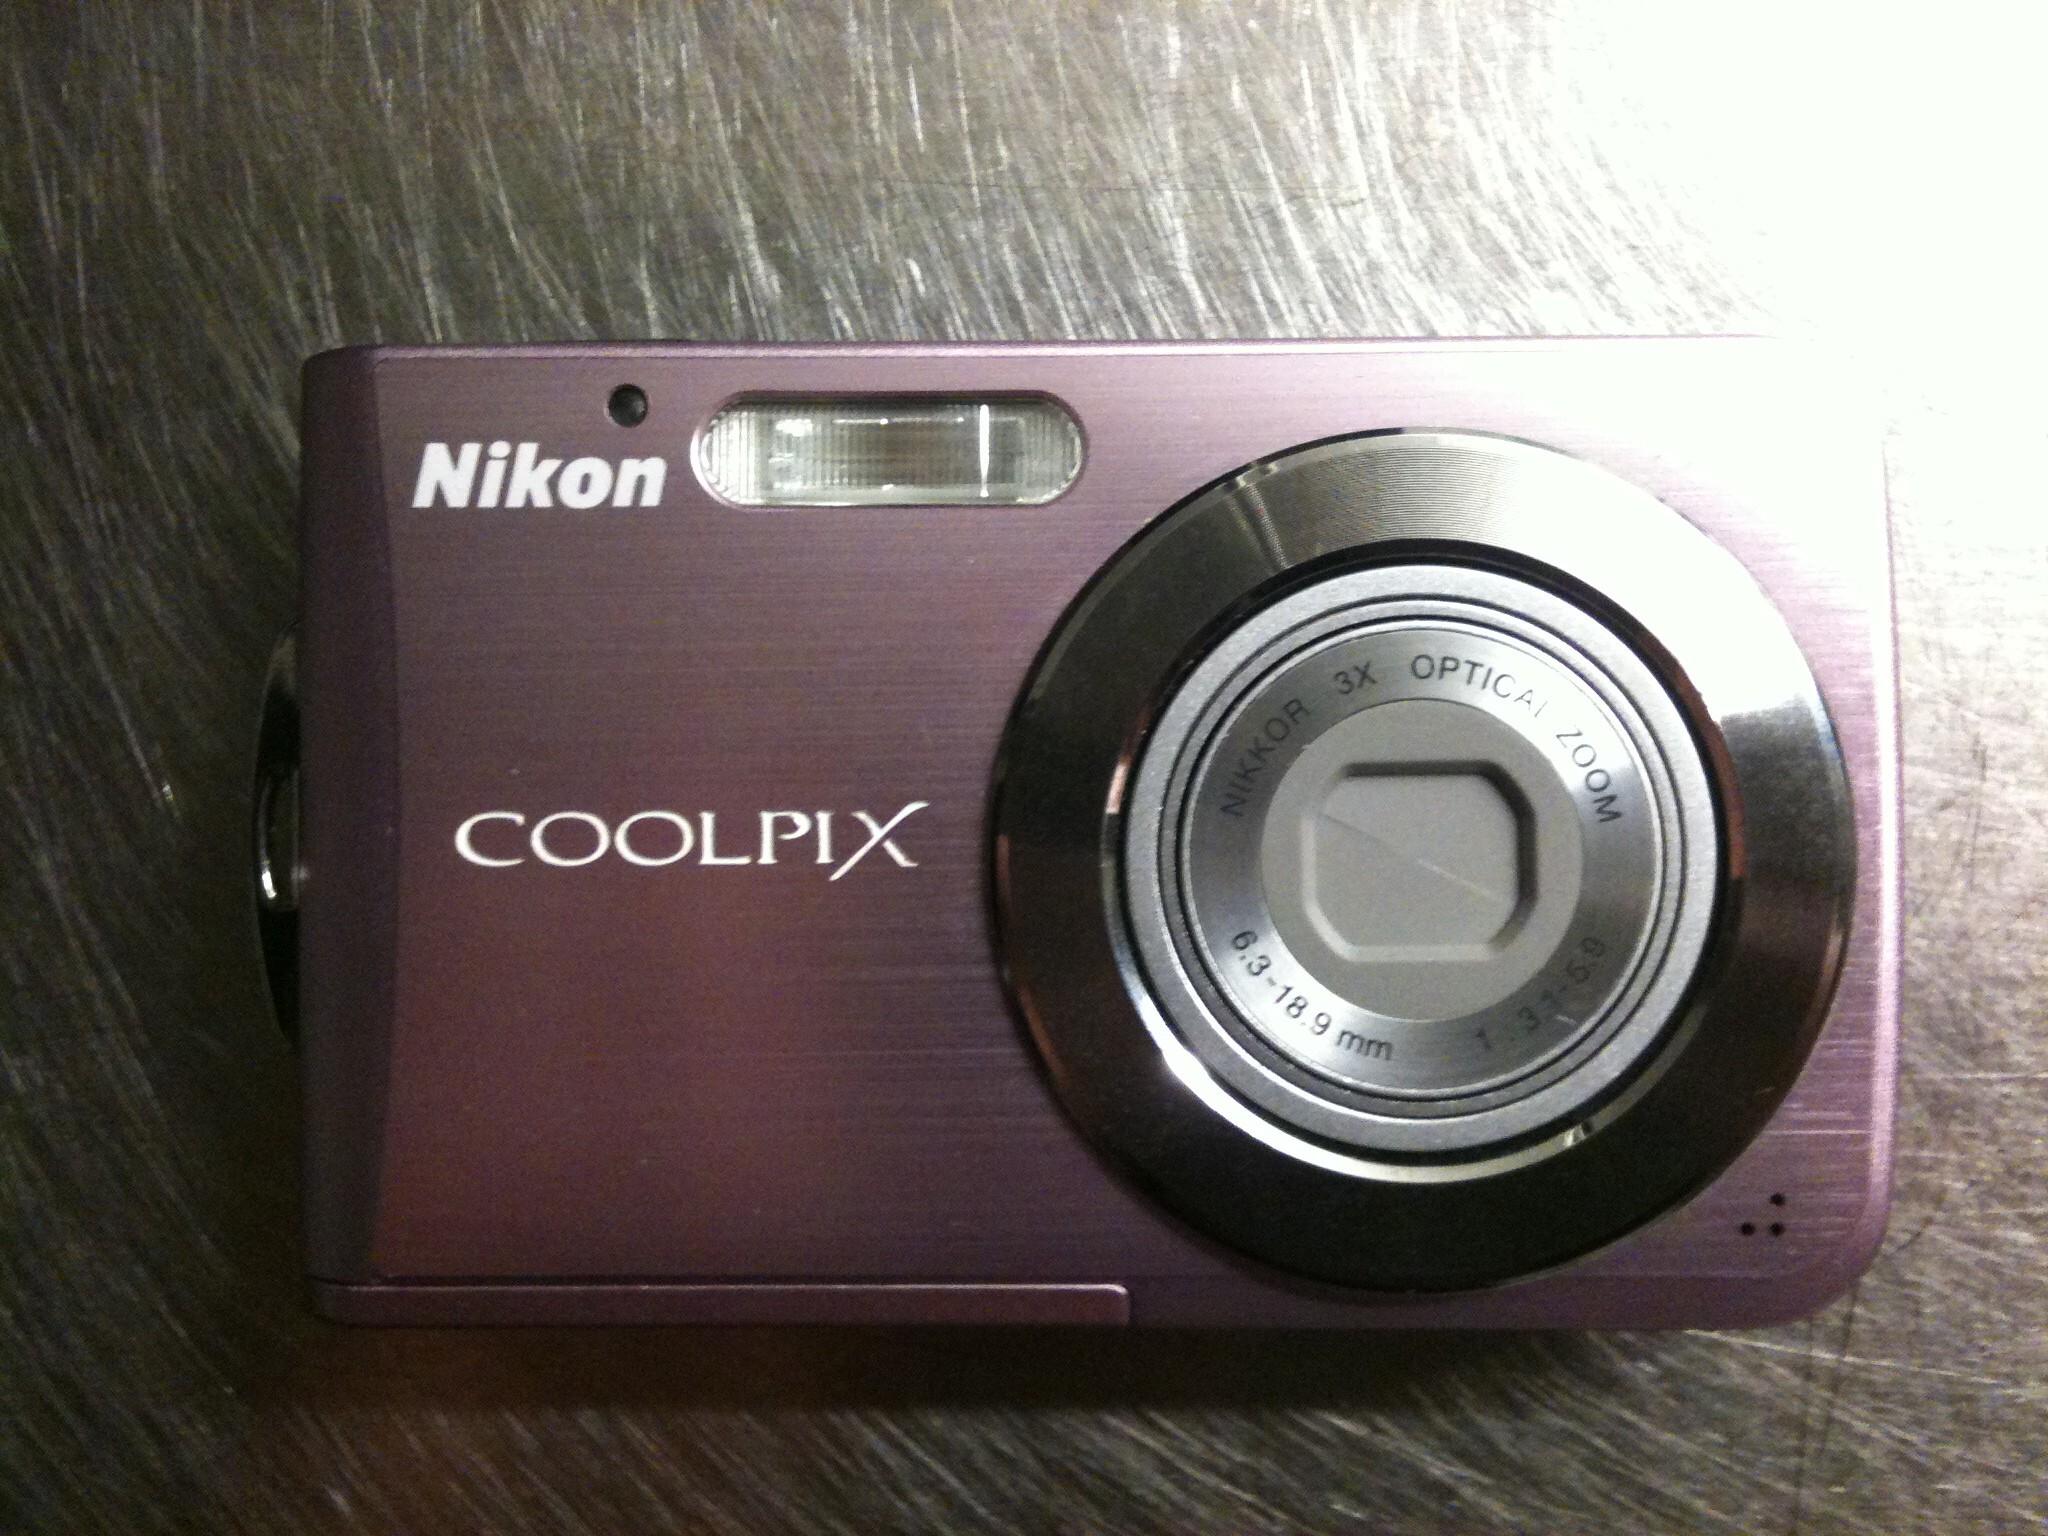 Ultrakompakt 8 megapixels Nikon digitalkamera